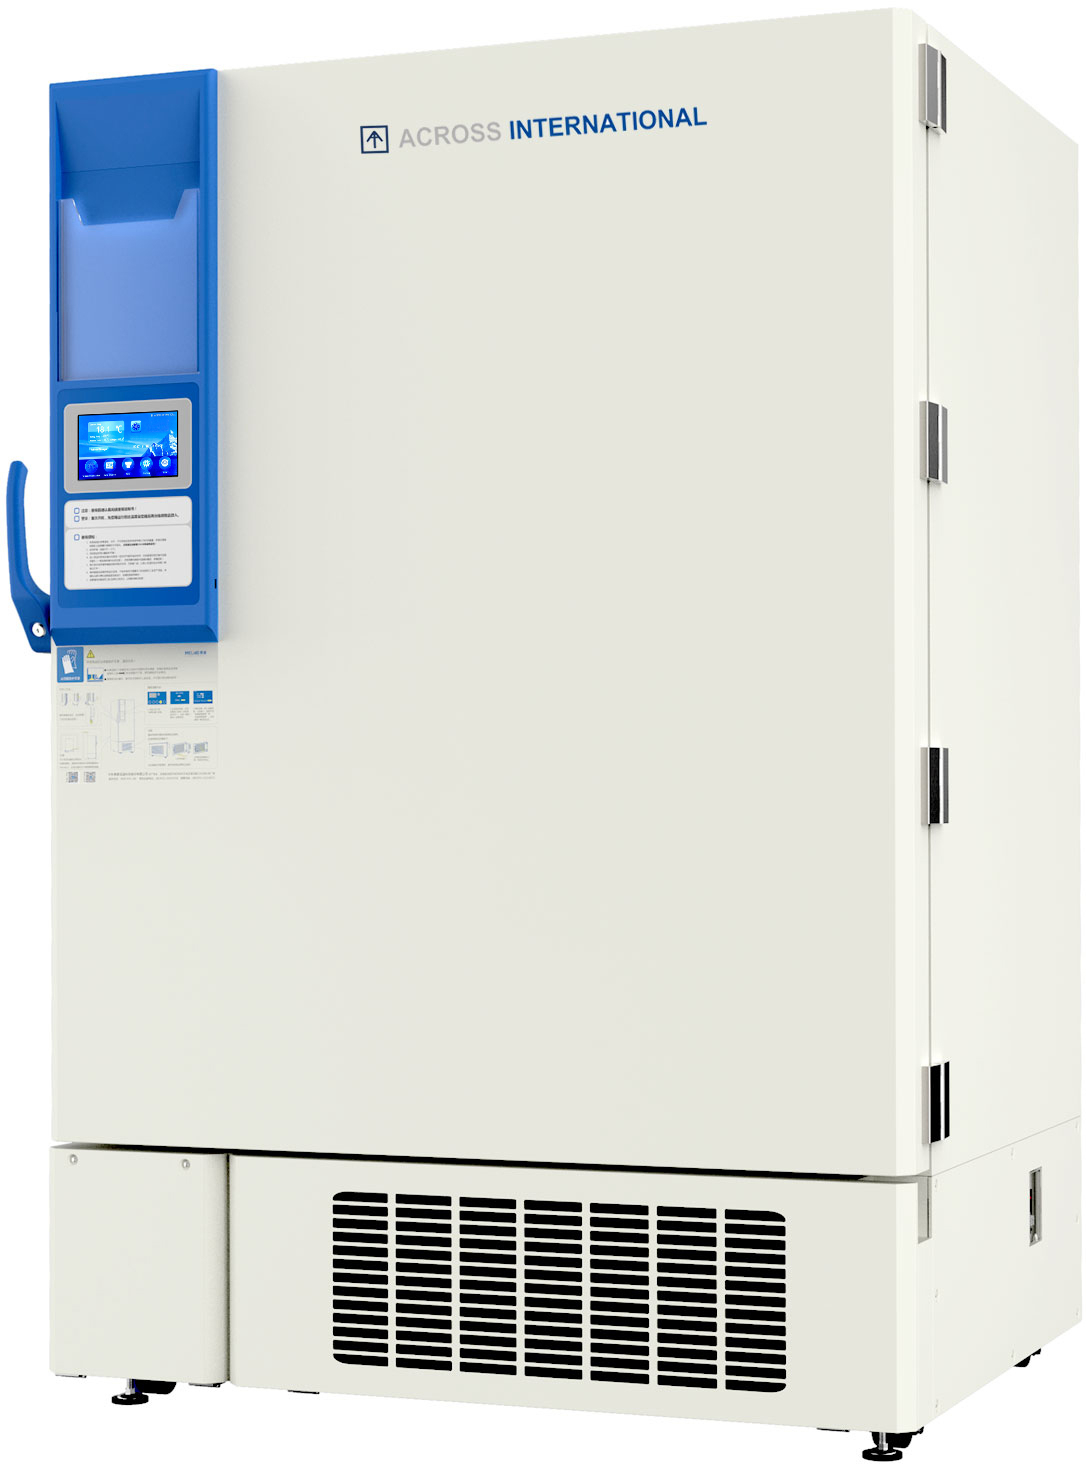 Across International 35 Cu Ft -86C Ultra-Low Upright Freezer UL CSA Certified 220V